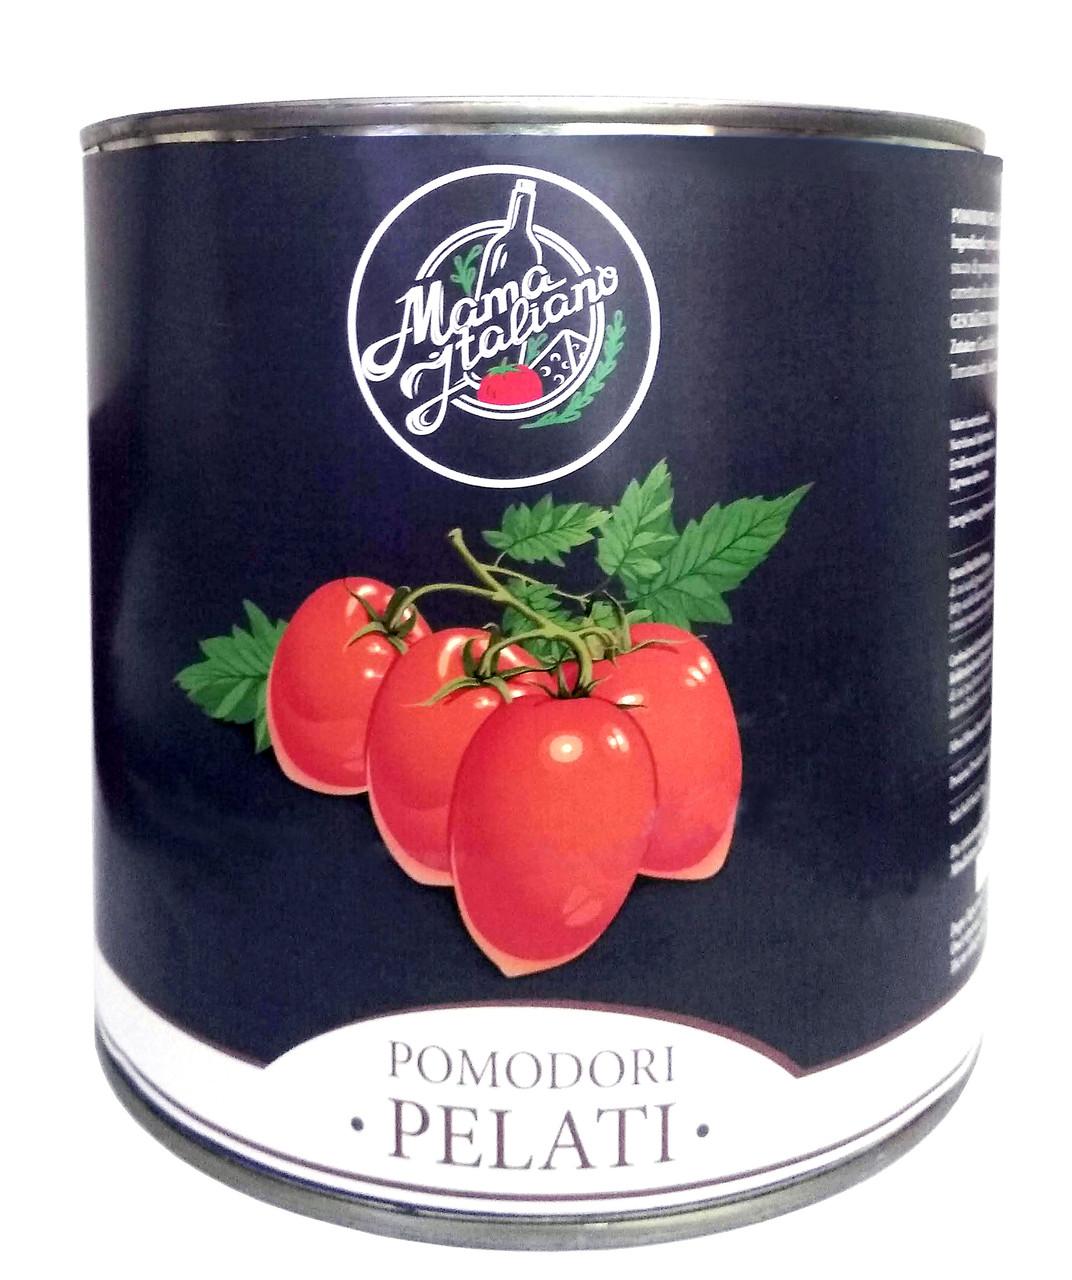 Помідори чищені Mama Italiano, 2.5 кг, (6шт)